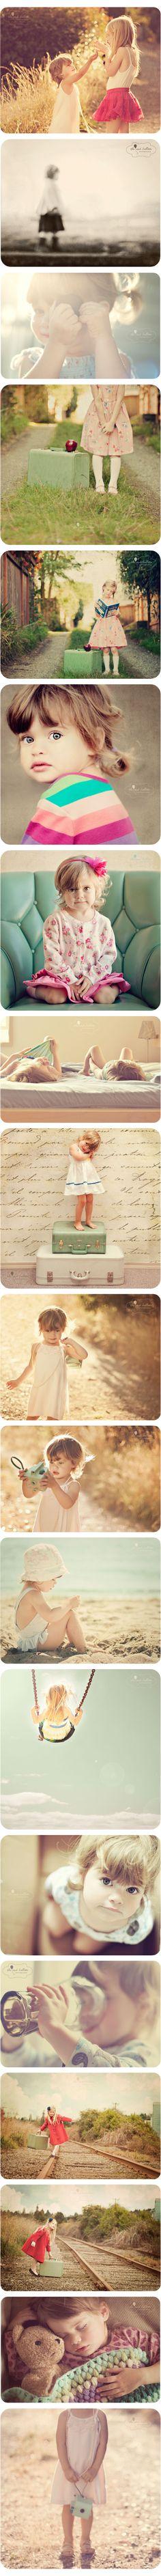 ♥ little girls, kid photos, kid photography, childhood, balloons, swing, photo shoots, children photography, kid poses